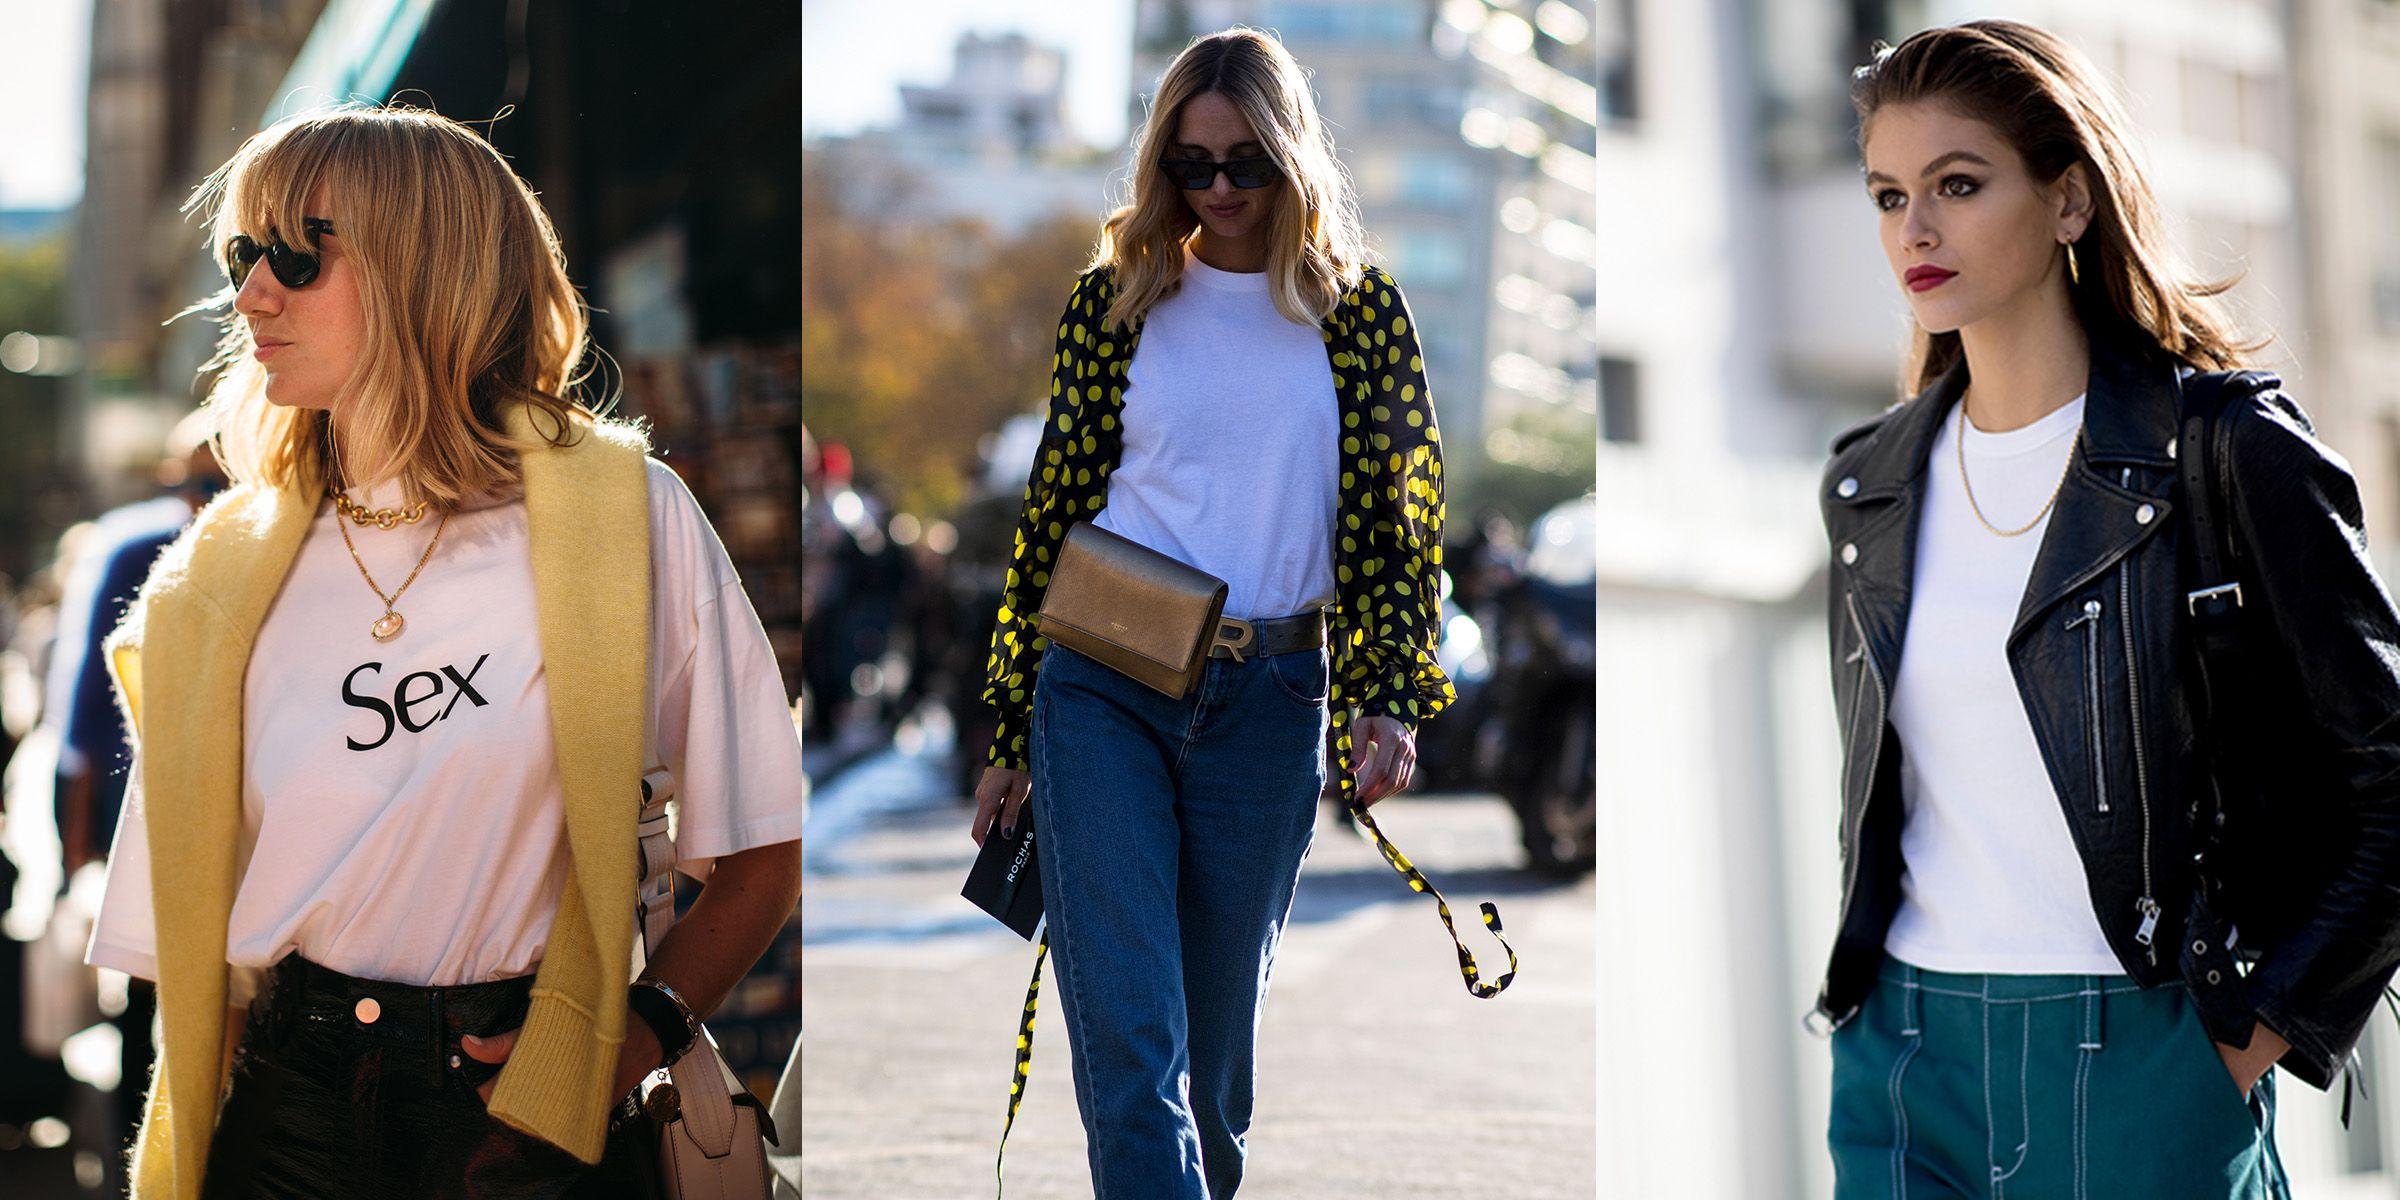 t-shirt-bianca-abbinamenti-primavera-estate-2019-street-style